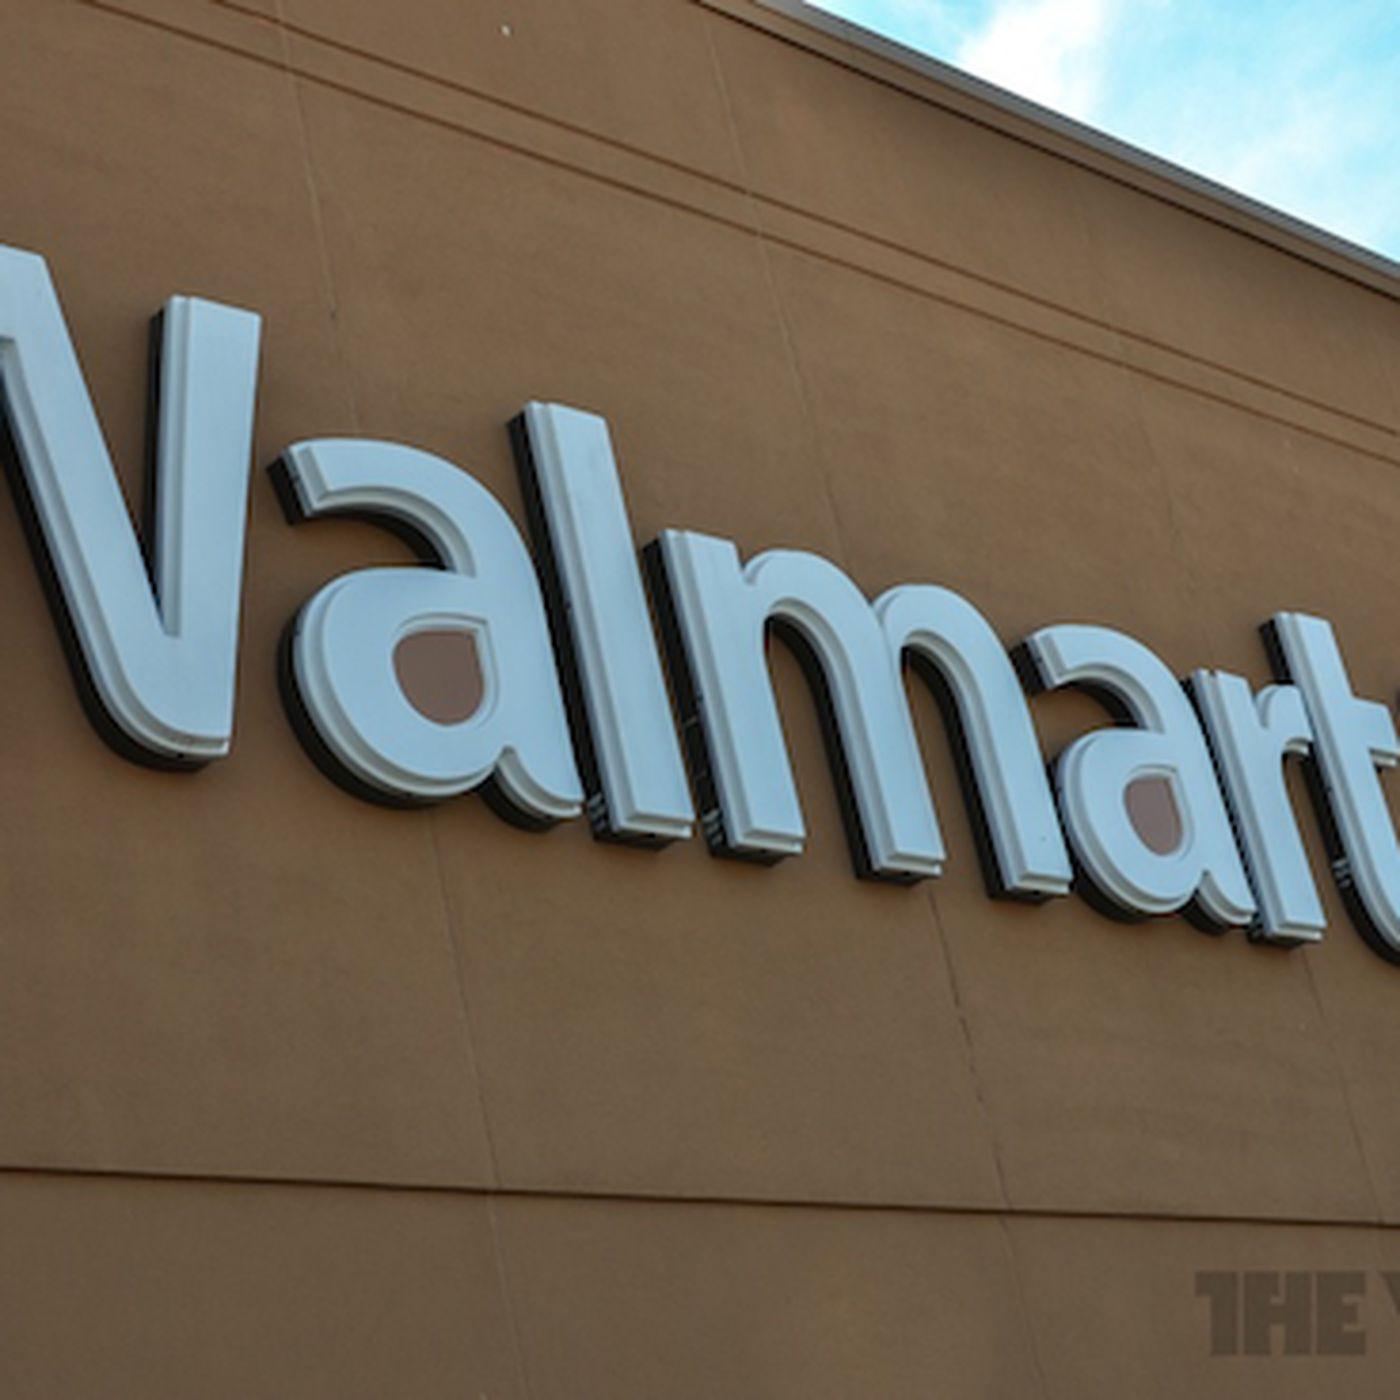 Walmart Black Friday Tech Deals 169 Airpods Pros 19 Chromecast 30 Switch Games The Verge